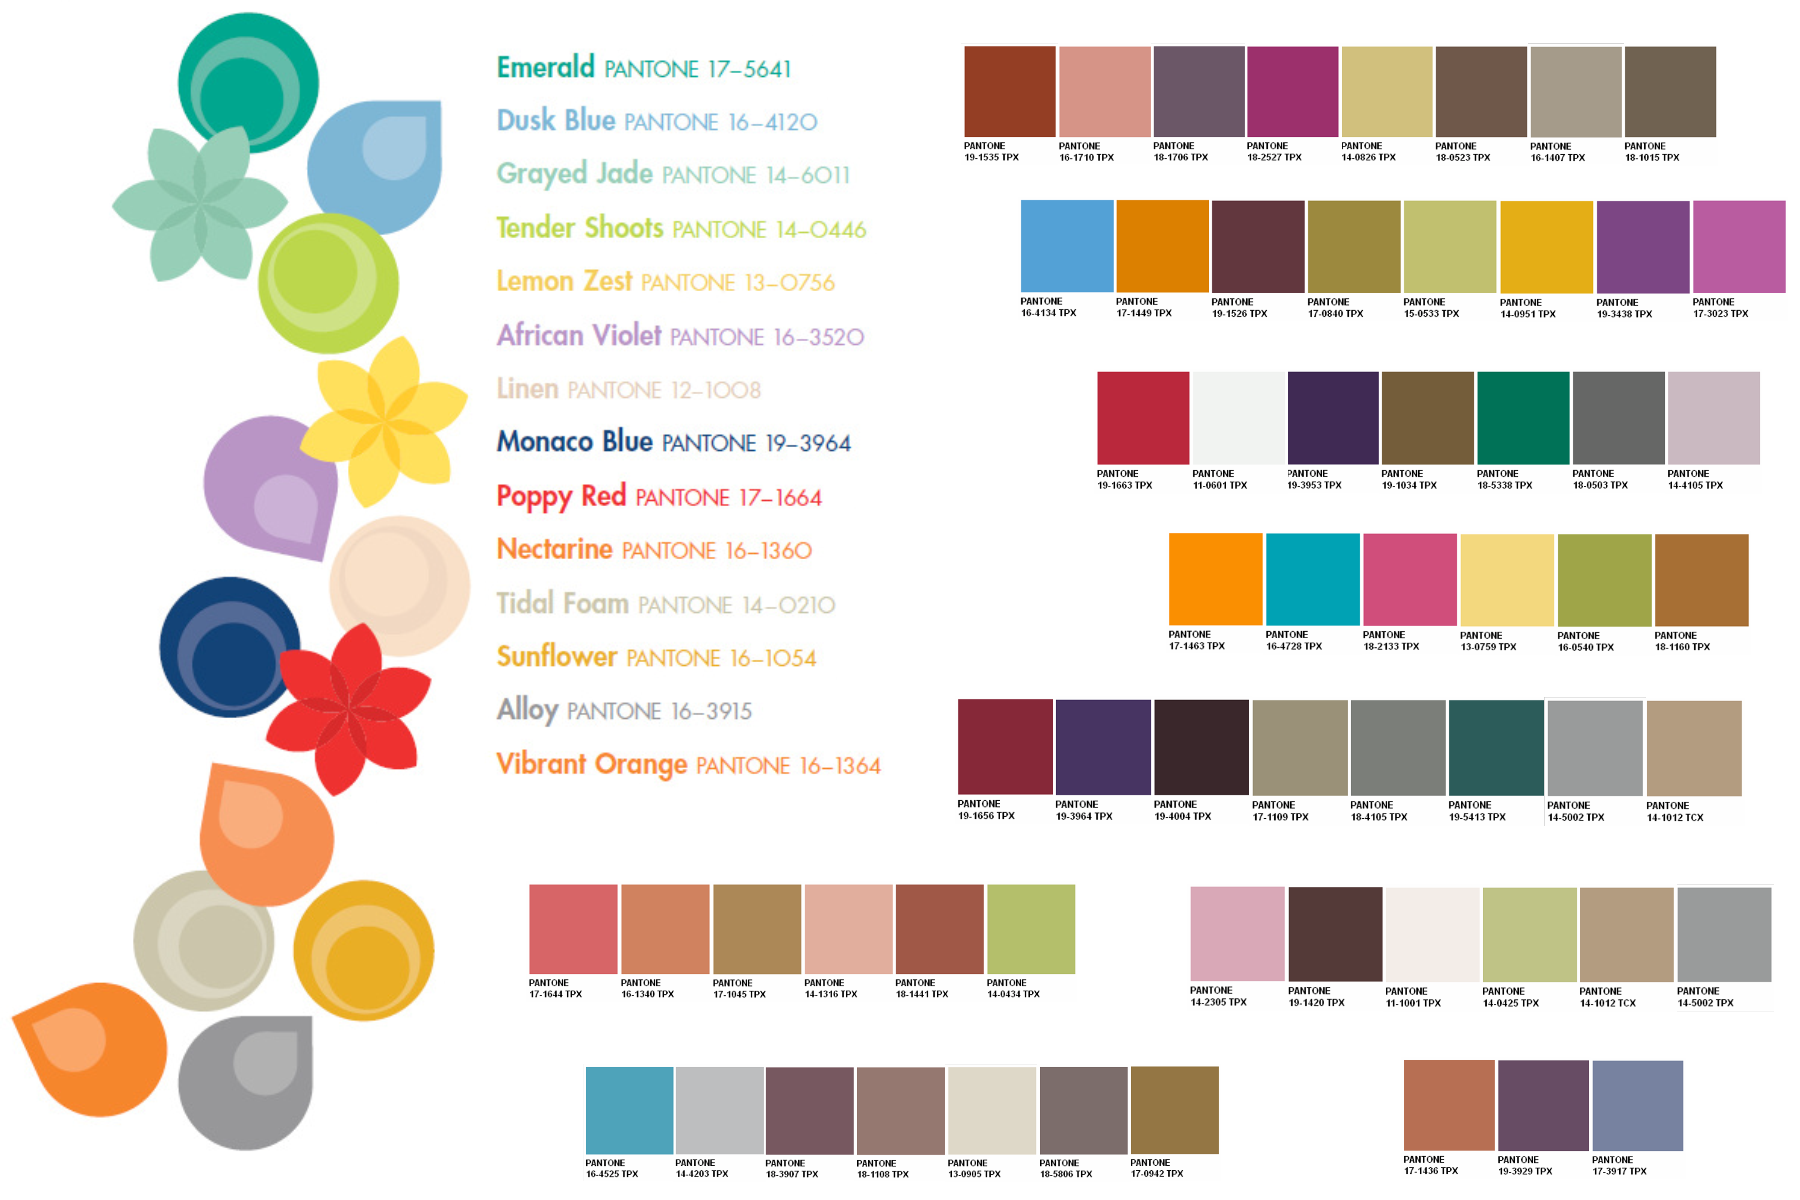 Sico palette 2013 images sico palette 2013 colour palettes for 2013 colour palettes for 2013 source abuse report nvjuhfo Choice Image